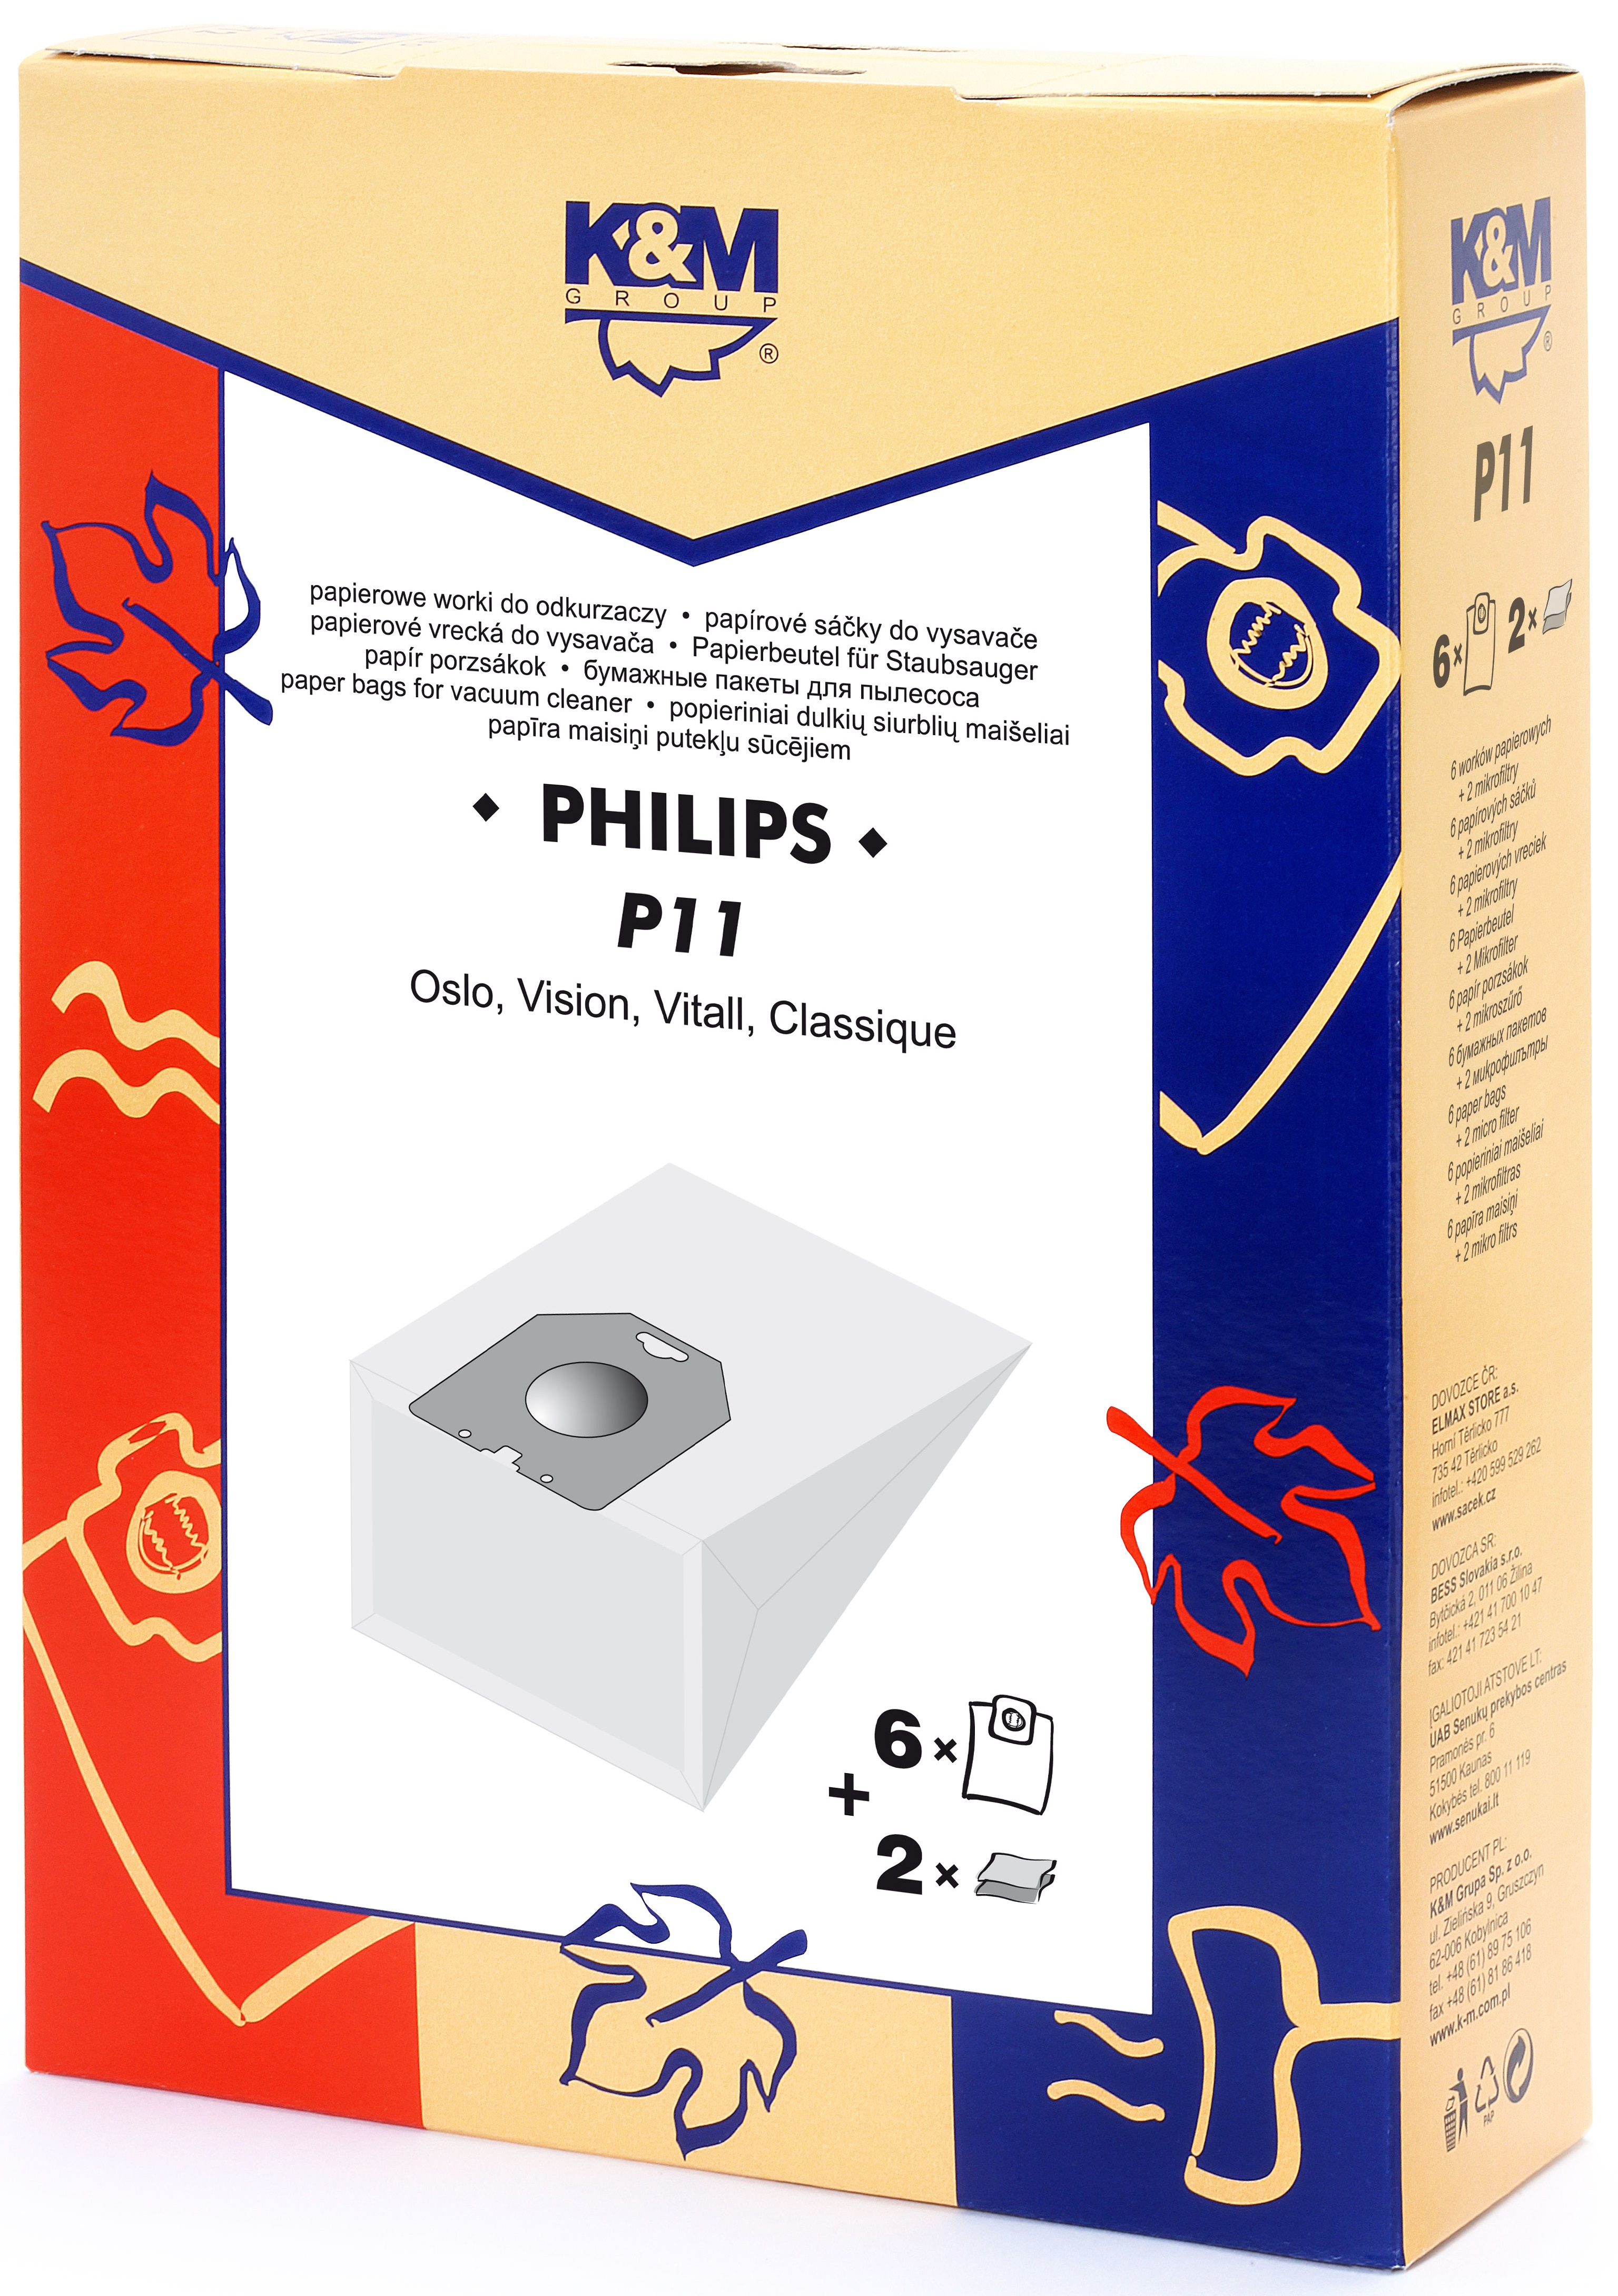 Sac aspirator Philips Oslo, Vision, hartie, 6X saci + 2X filtre, K&M 0